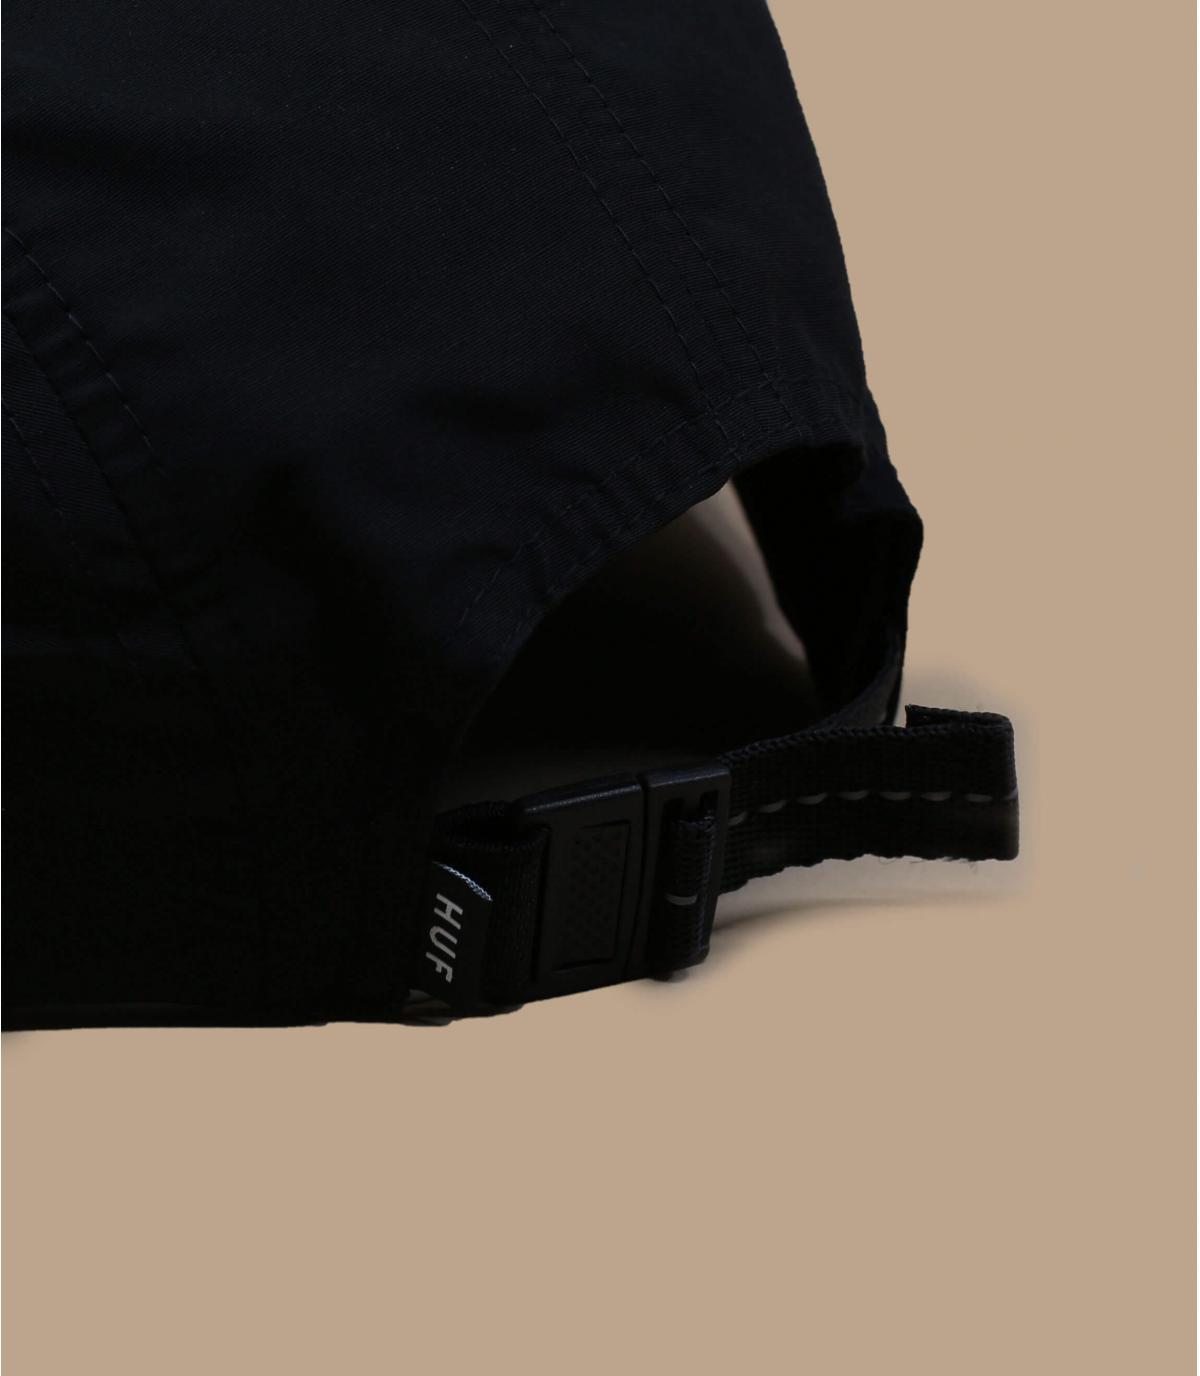 Détails Nylon Stash pocket 5Panel black - image 4